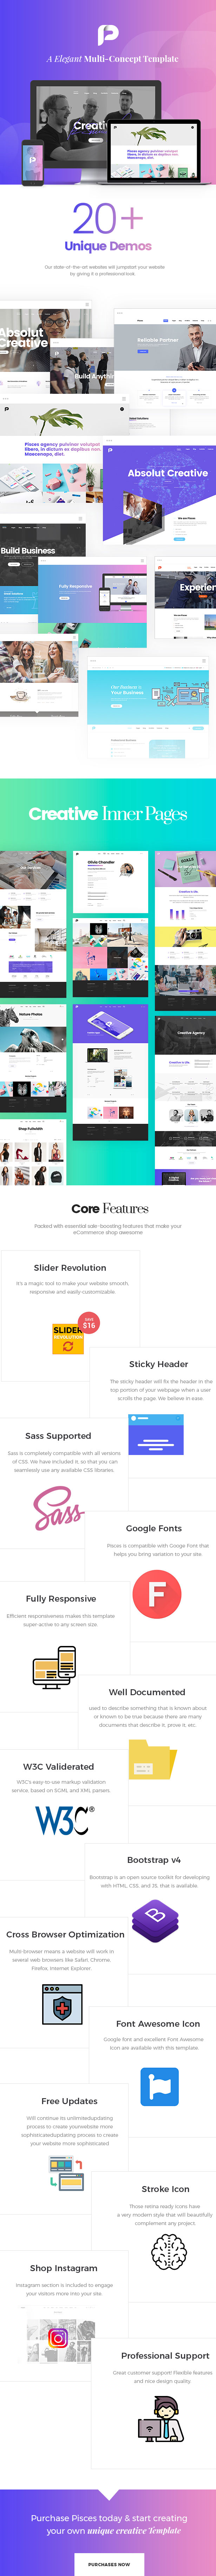 Pisces - Multi Concept Creative Bootstrap 4 Template - 1